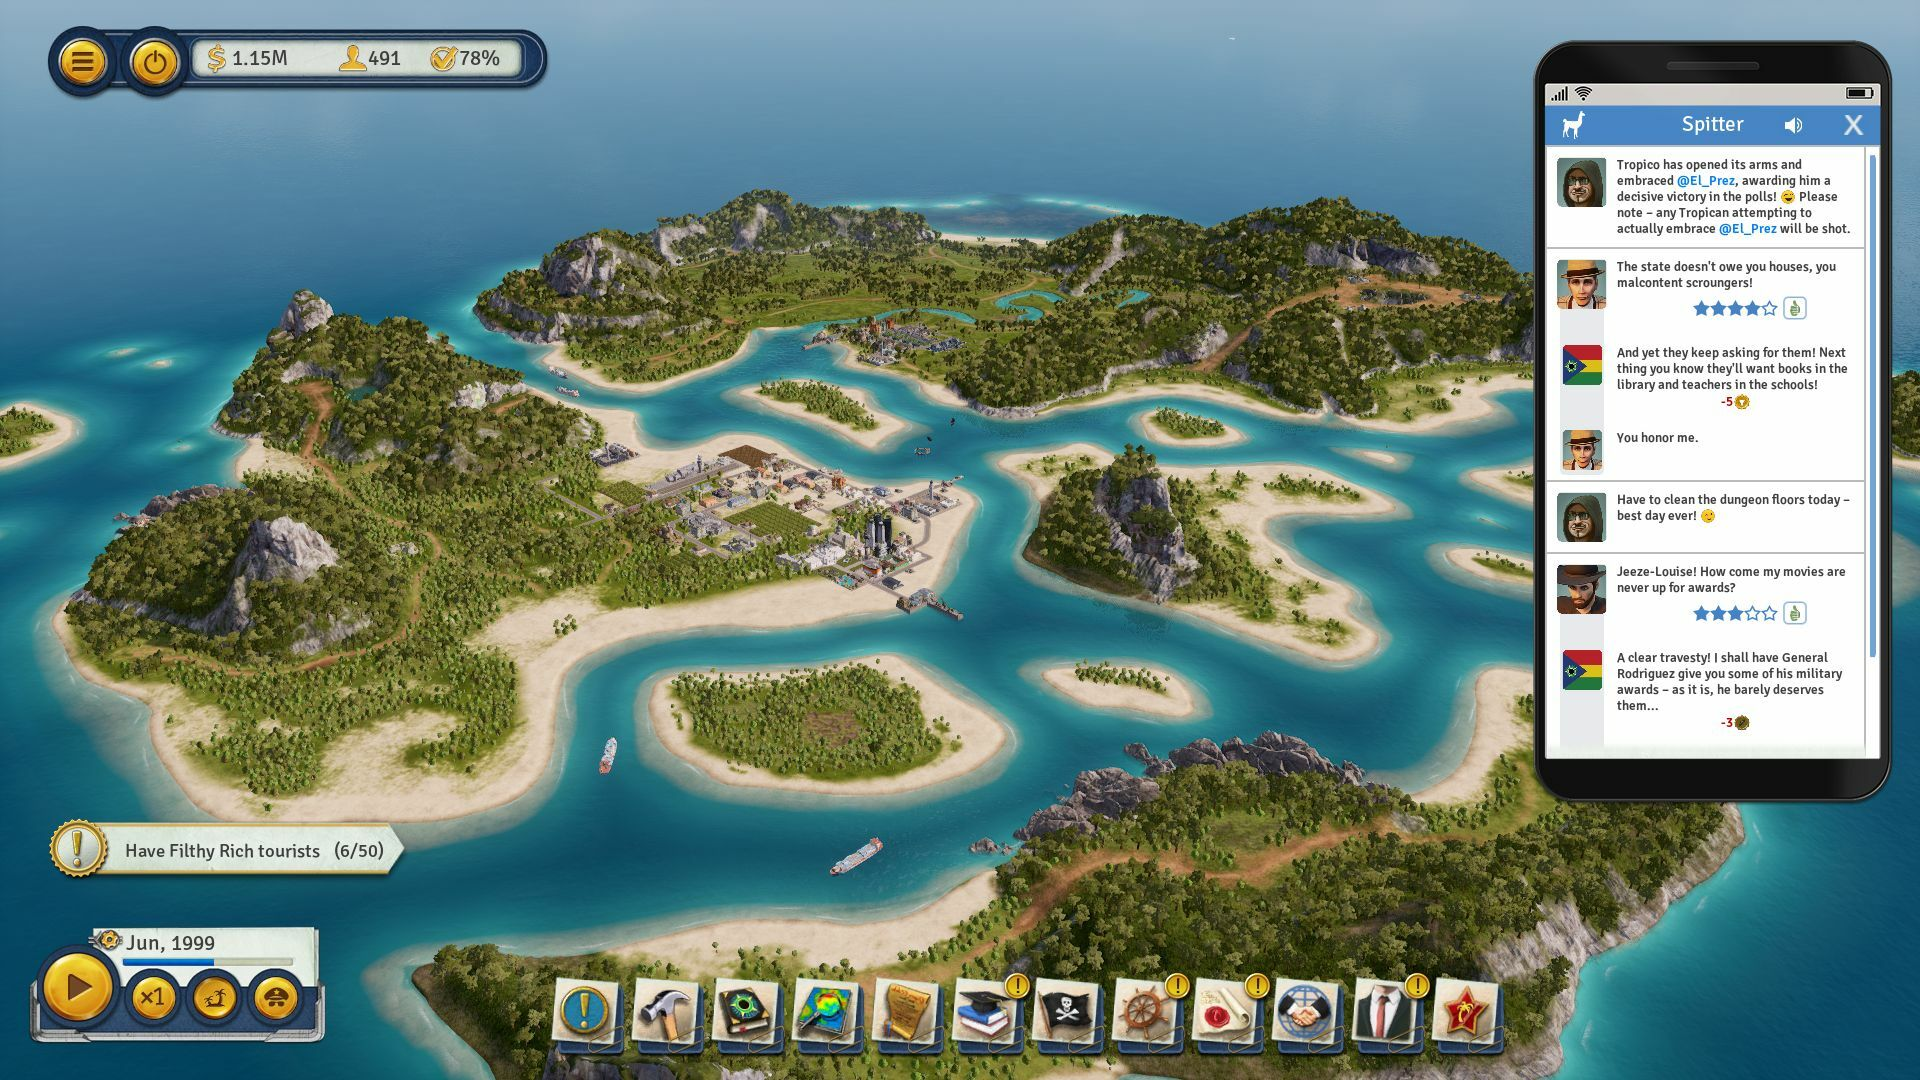 tropico-6-el-prez-edition-pc-screenshot-01